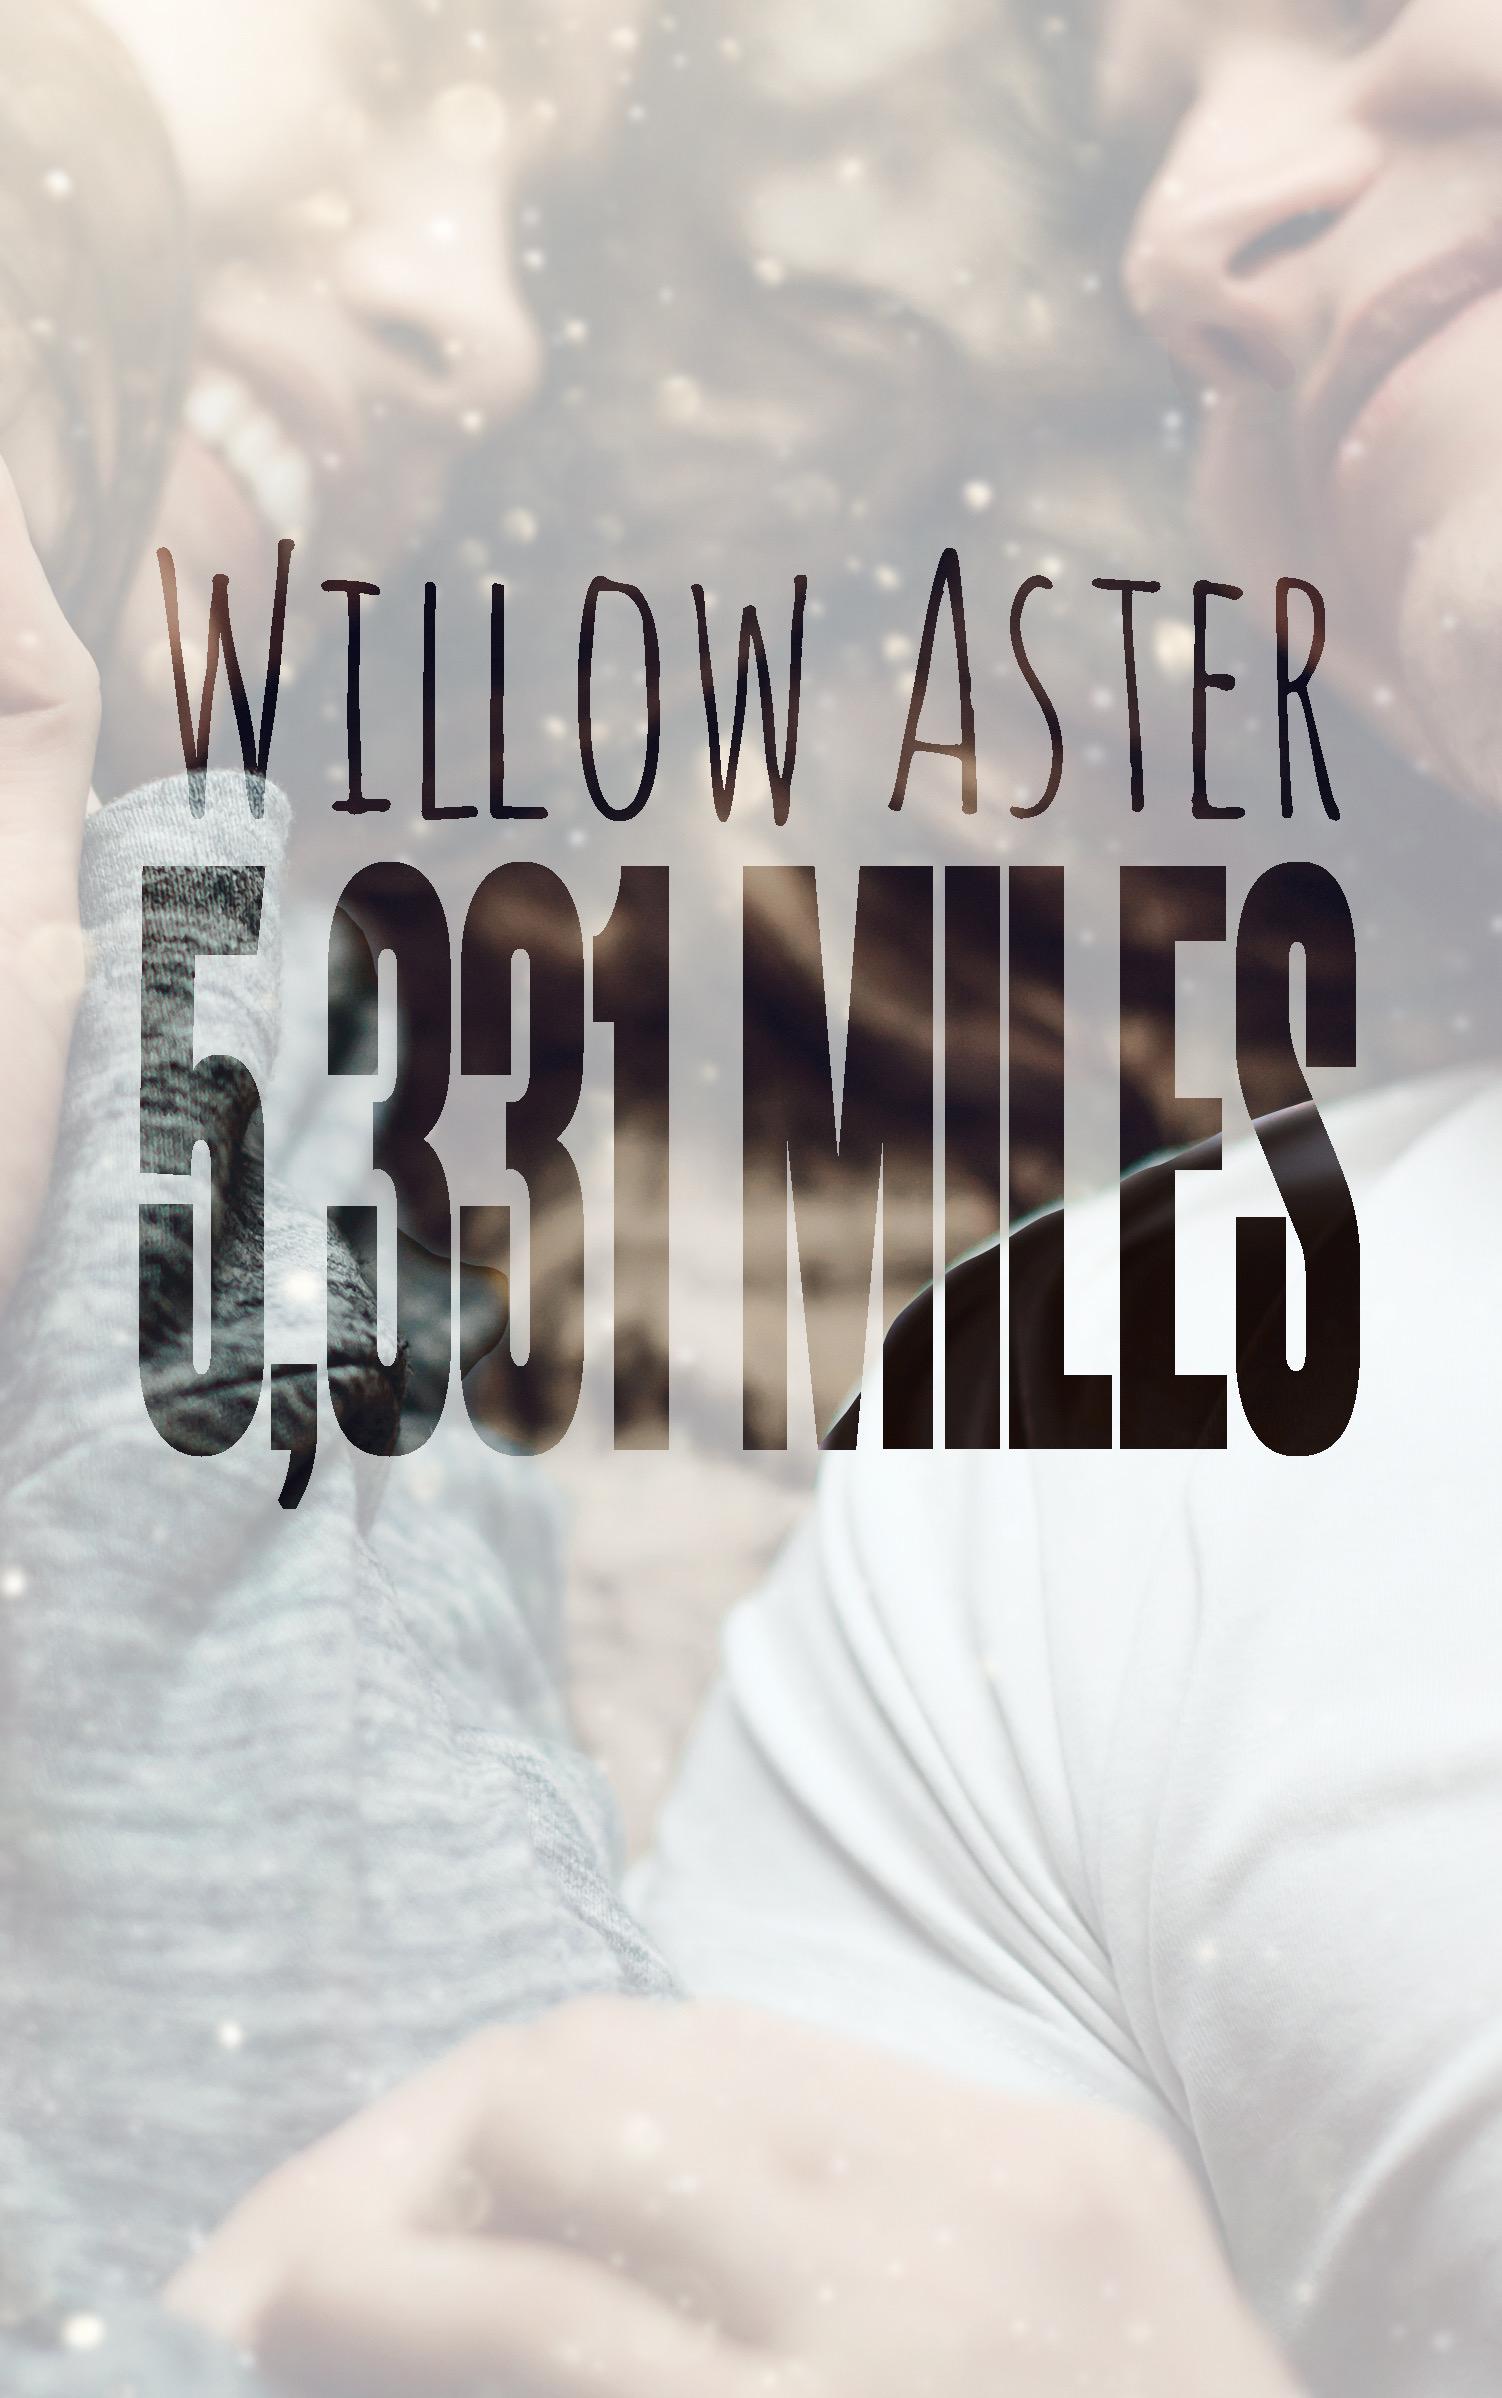 5,331 Miles FRONTpromo.jpeg